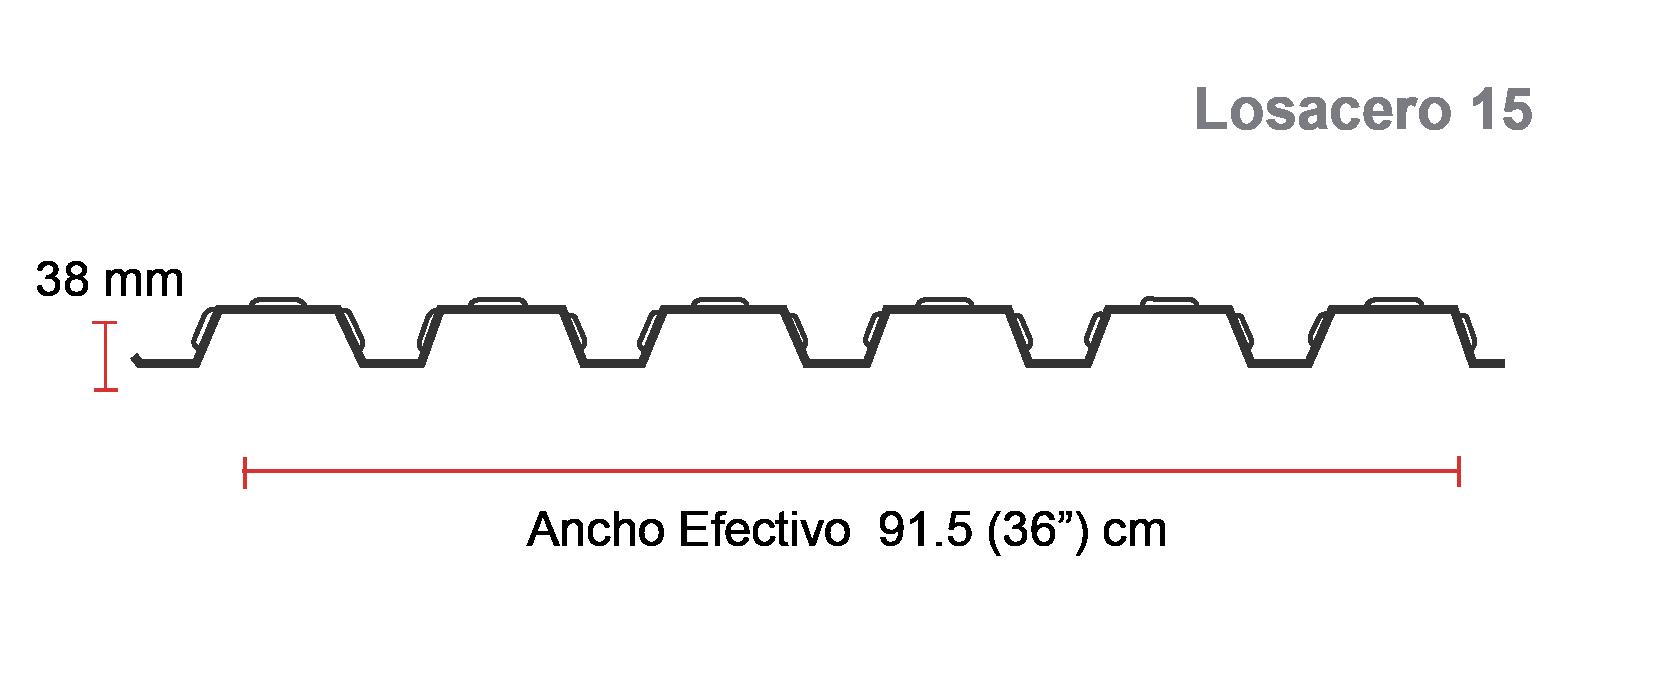 medidas-lamina-losacero-15-ternium